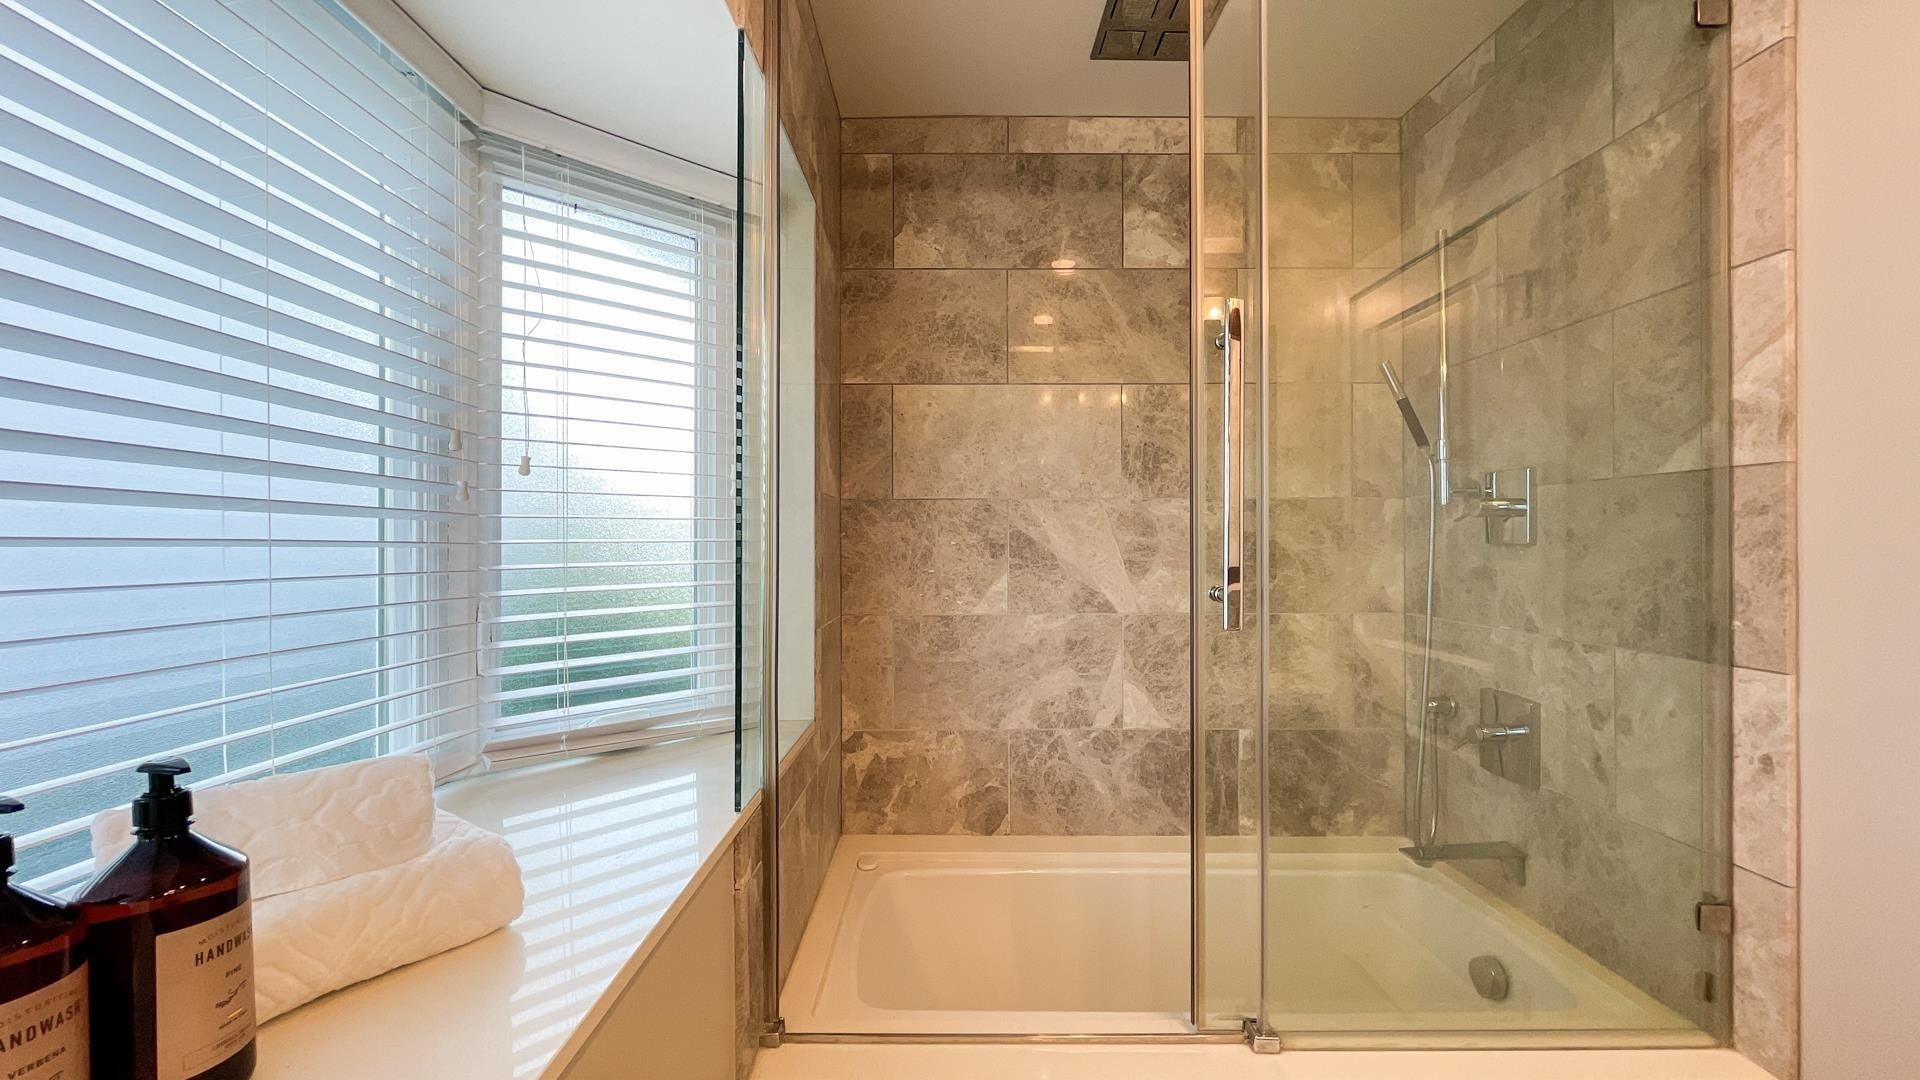 1168 JEFFERSON AVENUE - Ambleside House/Single Family for sale, 6 Bedrooms (R2602275) - #15